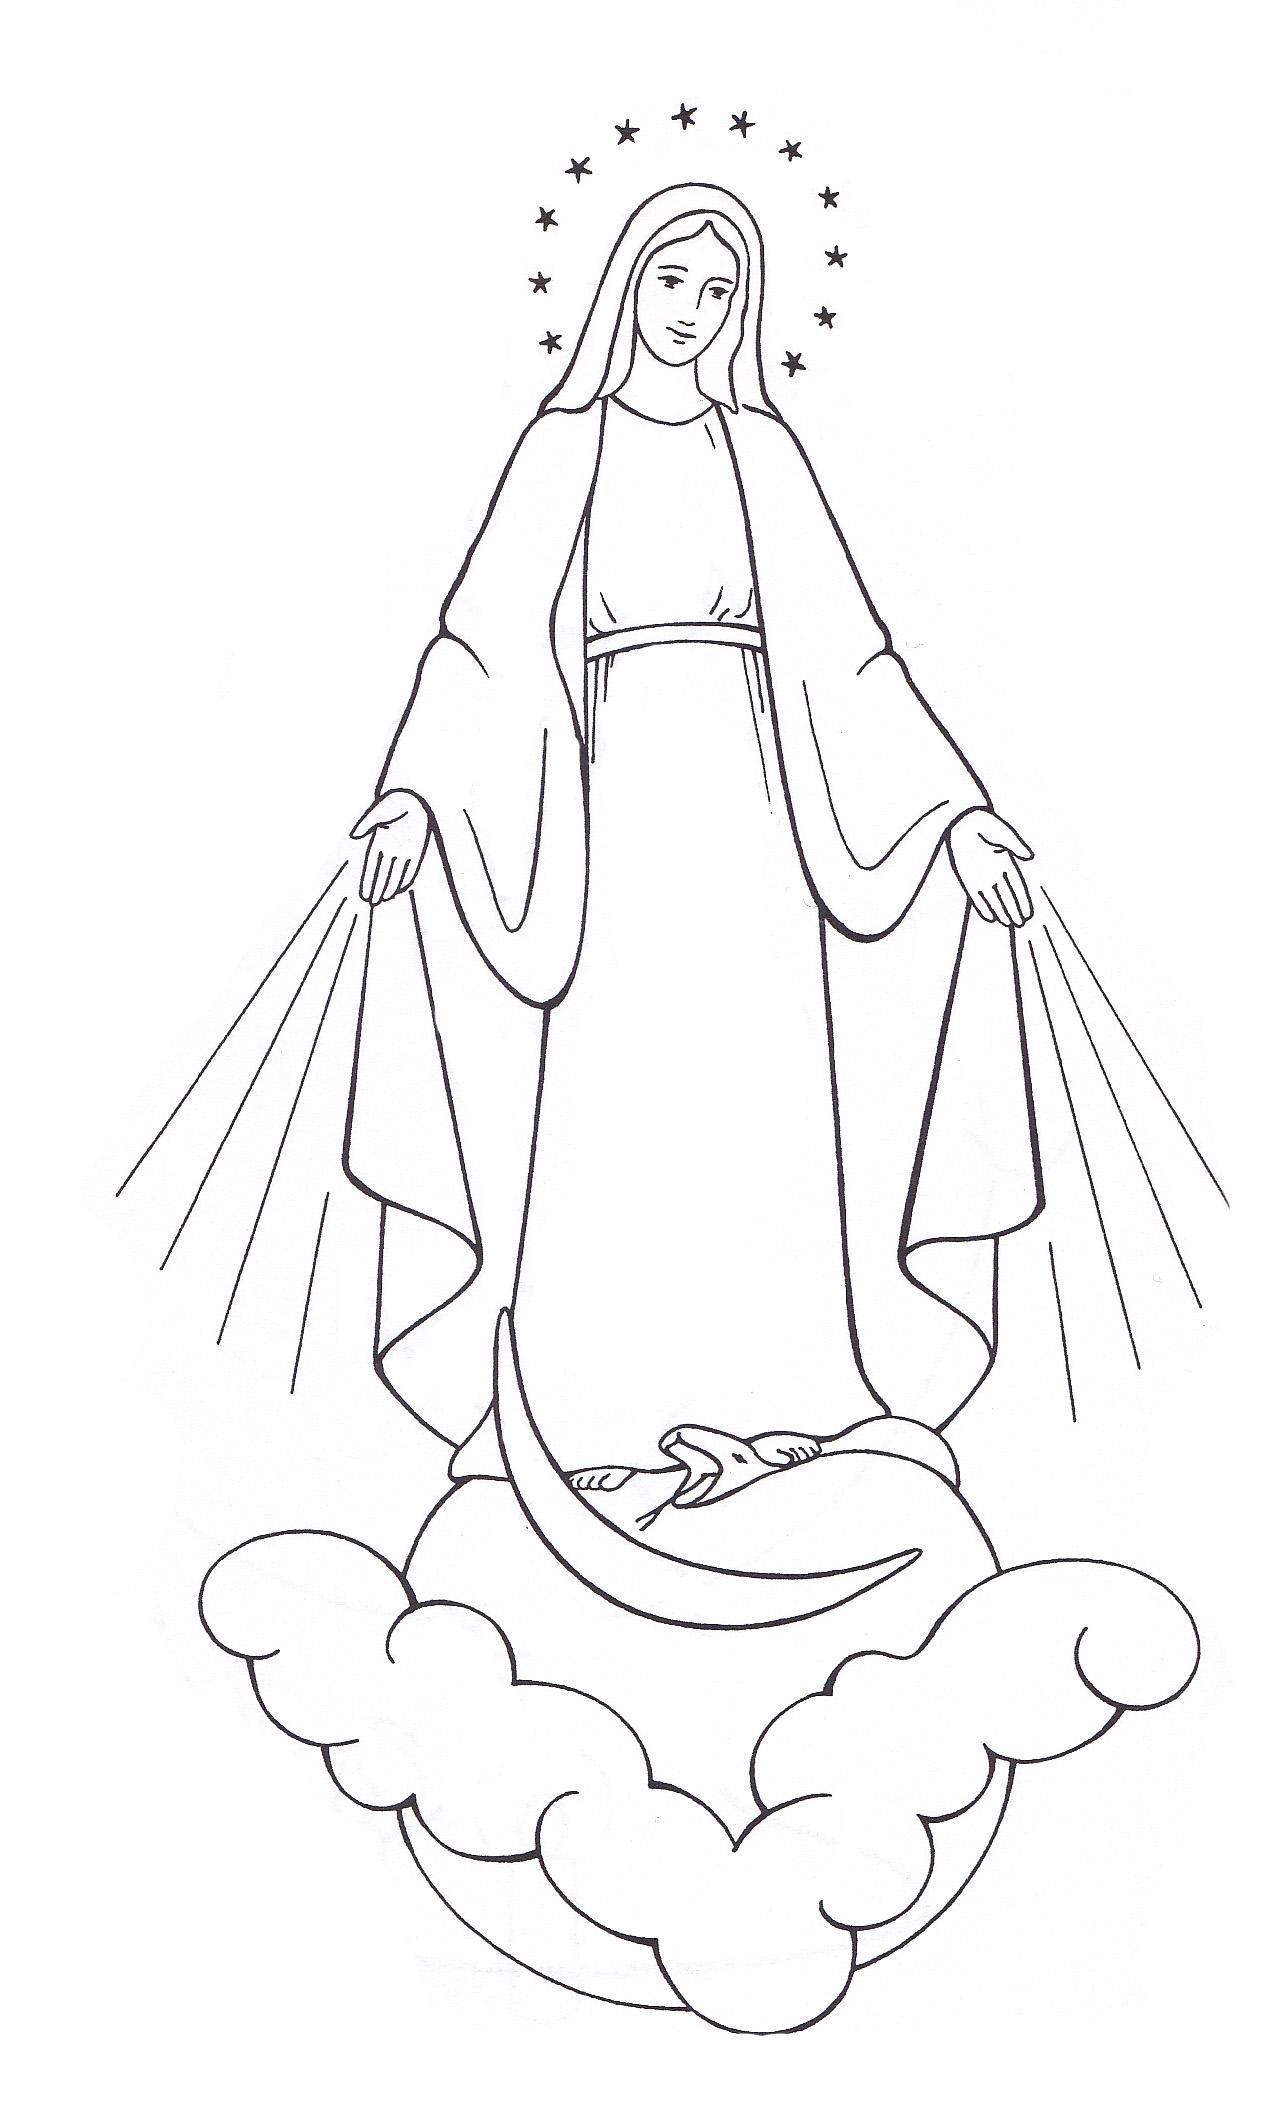 Our Lady Catholic Coloring Page | rajzolt angyalok, tündérek, szt ...